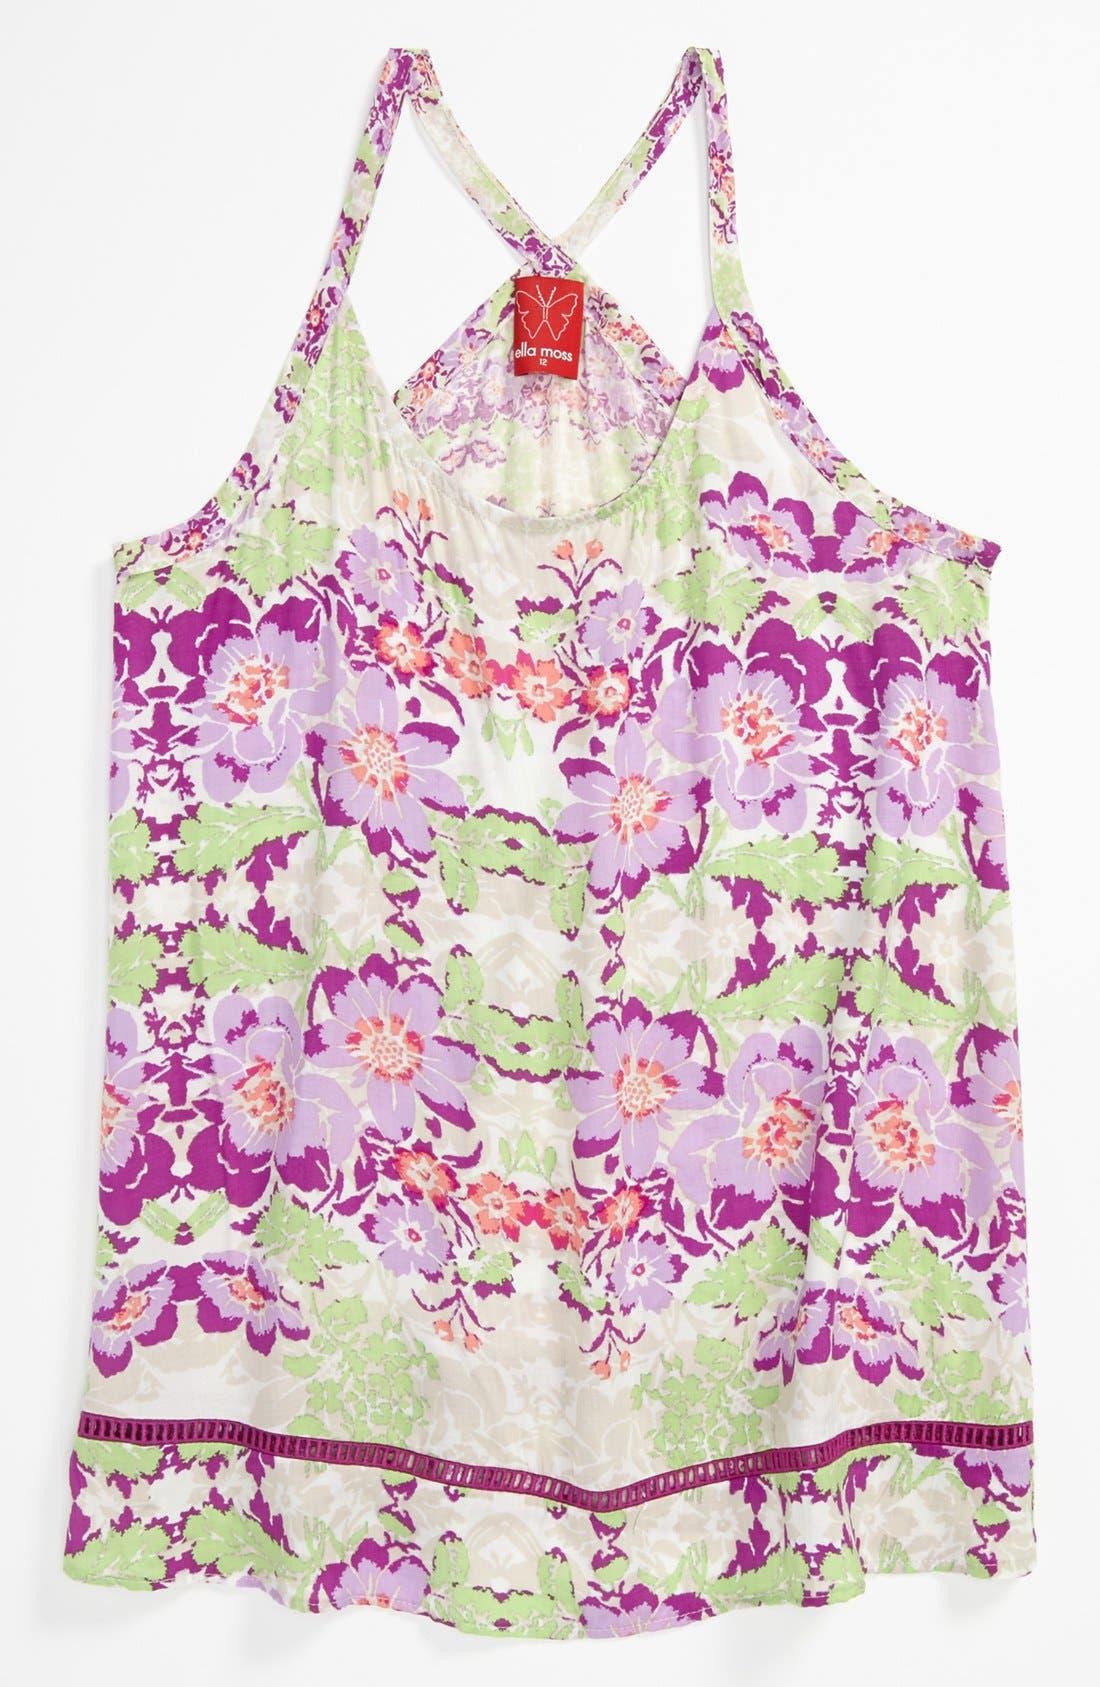 Alternate Image 1 Selected - Ella Moss 'Floral Lei' Tank Top (Big Girls)